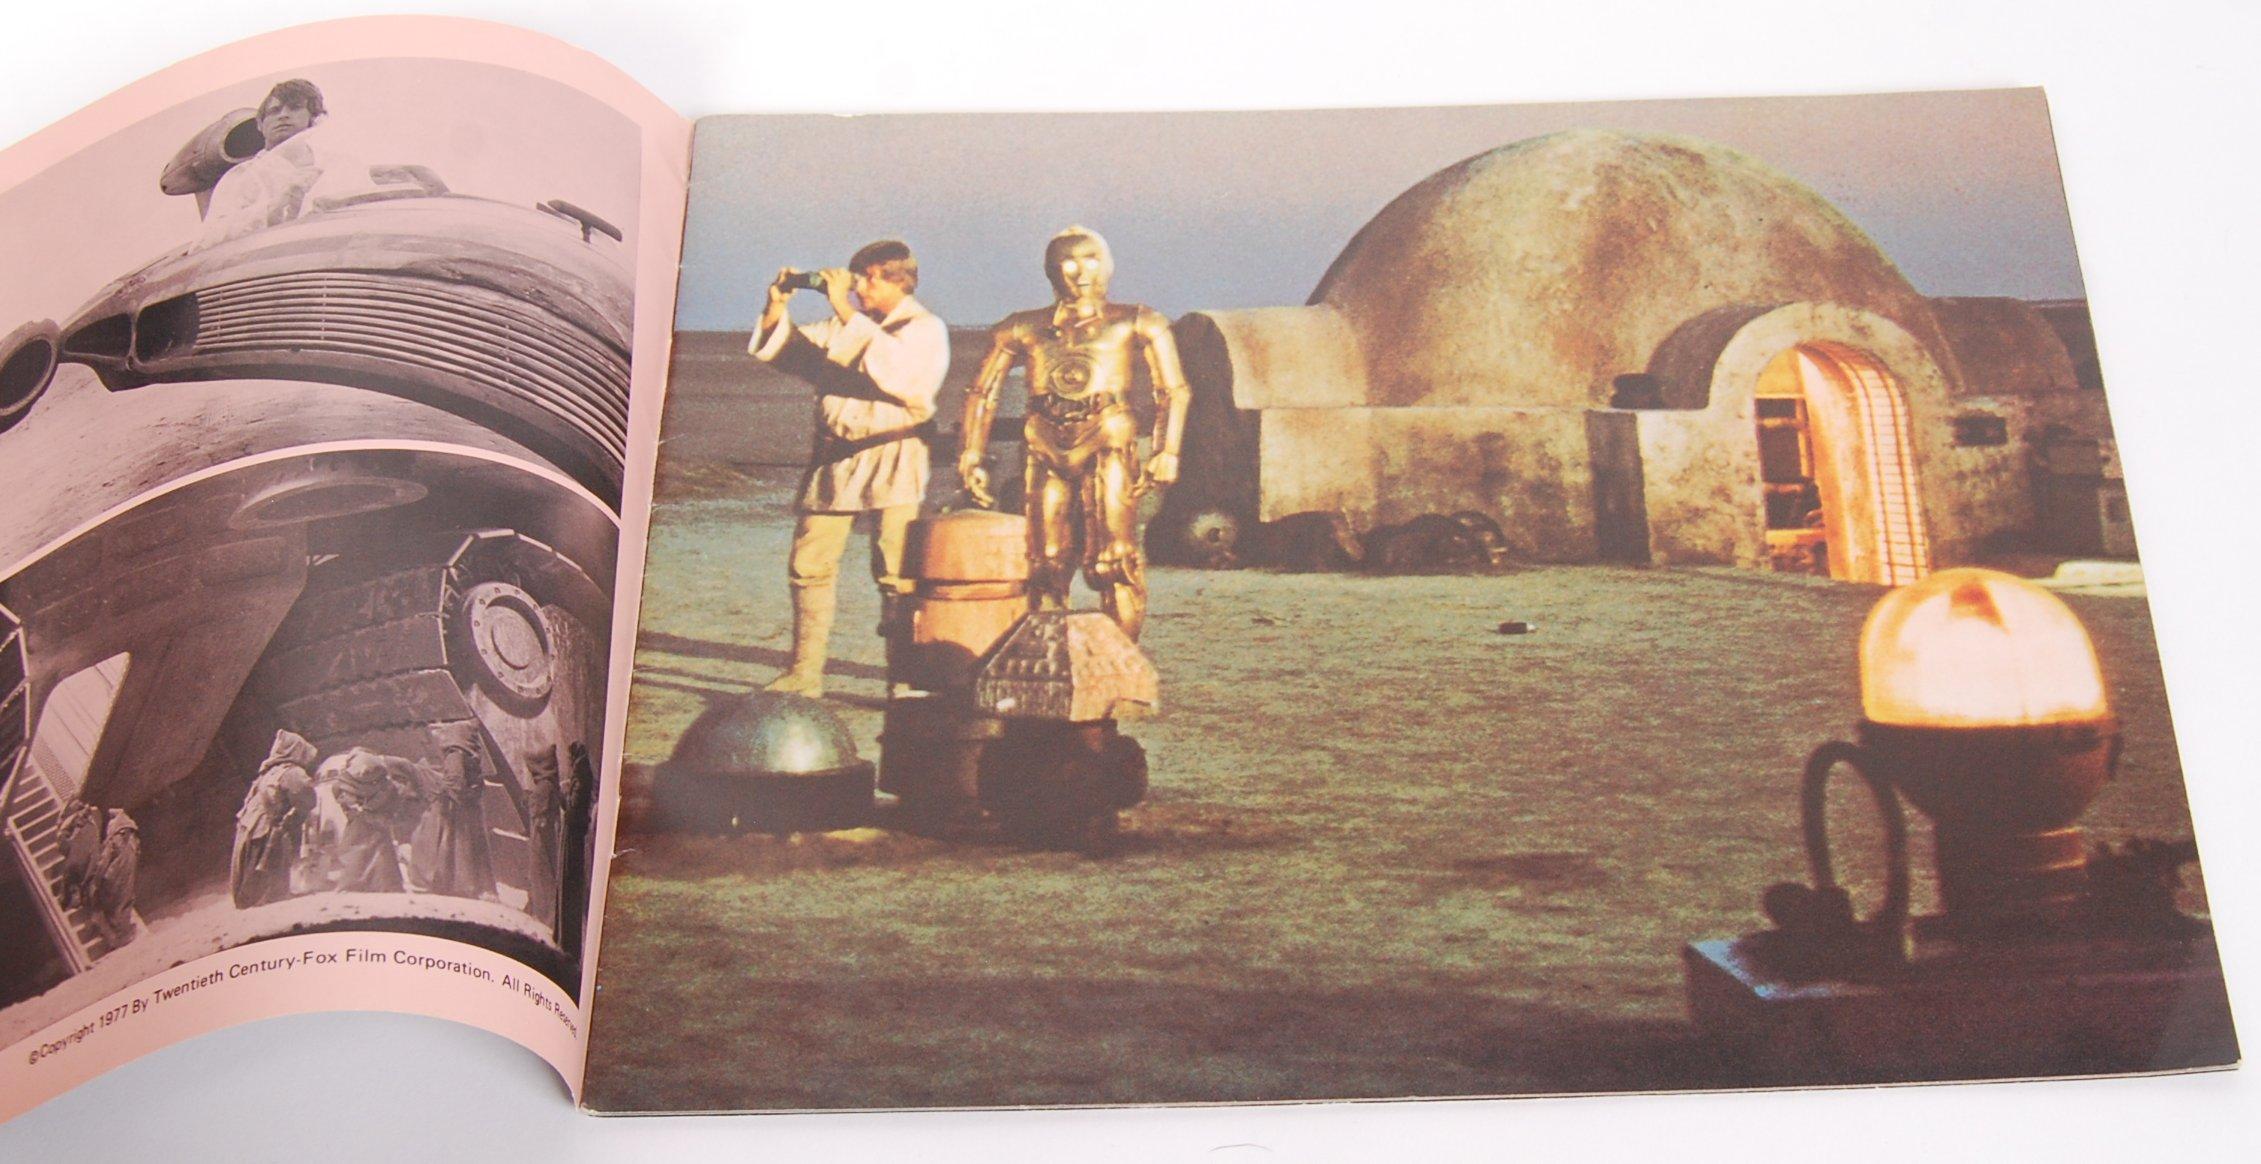 RARE ORIGINAL 1977 STAR WARS UK CINEMA RELEASE BRO - Image 2 of 4